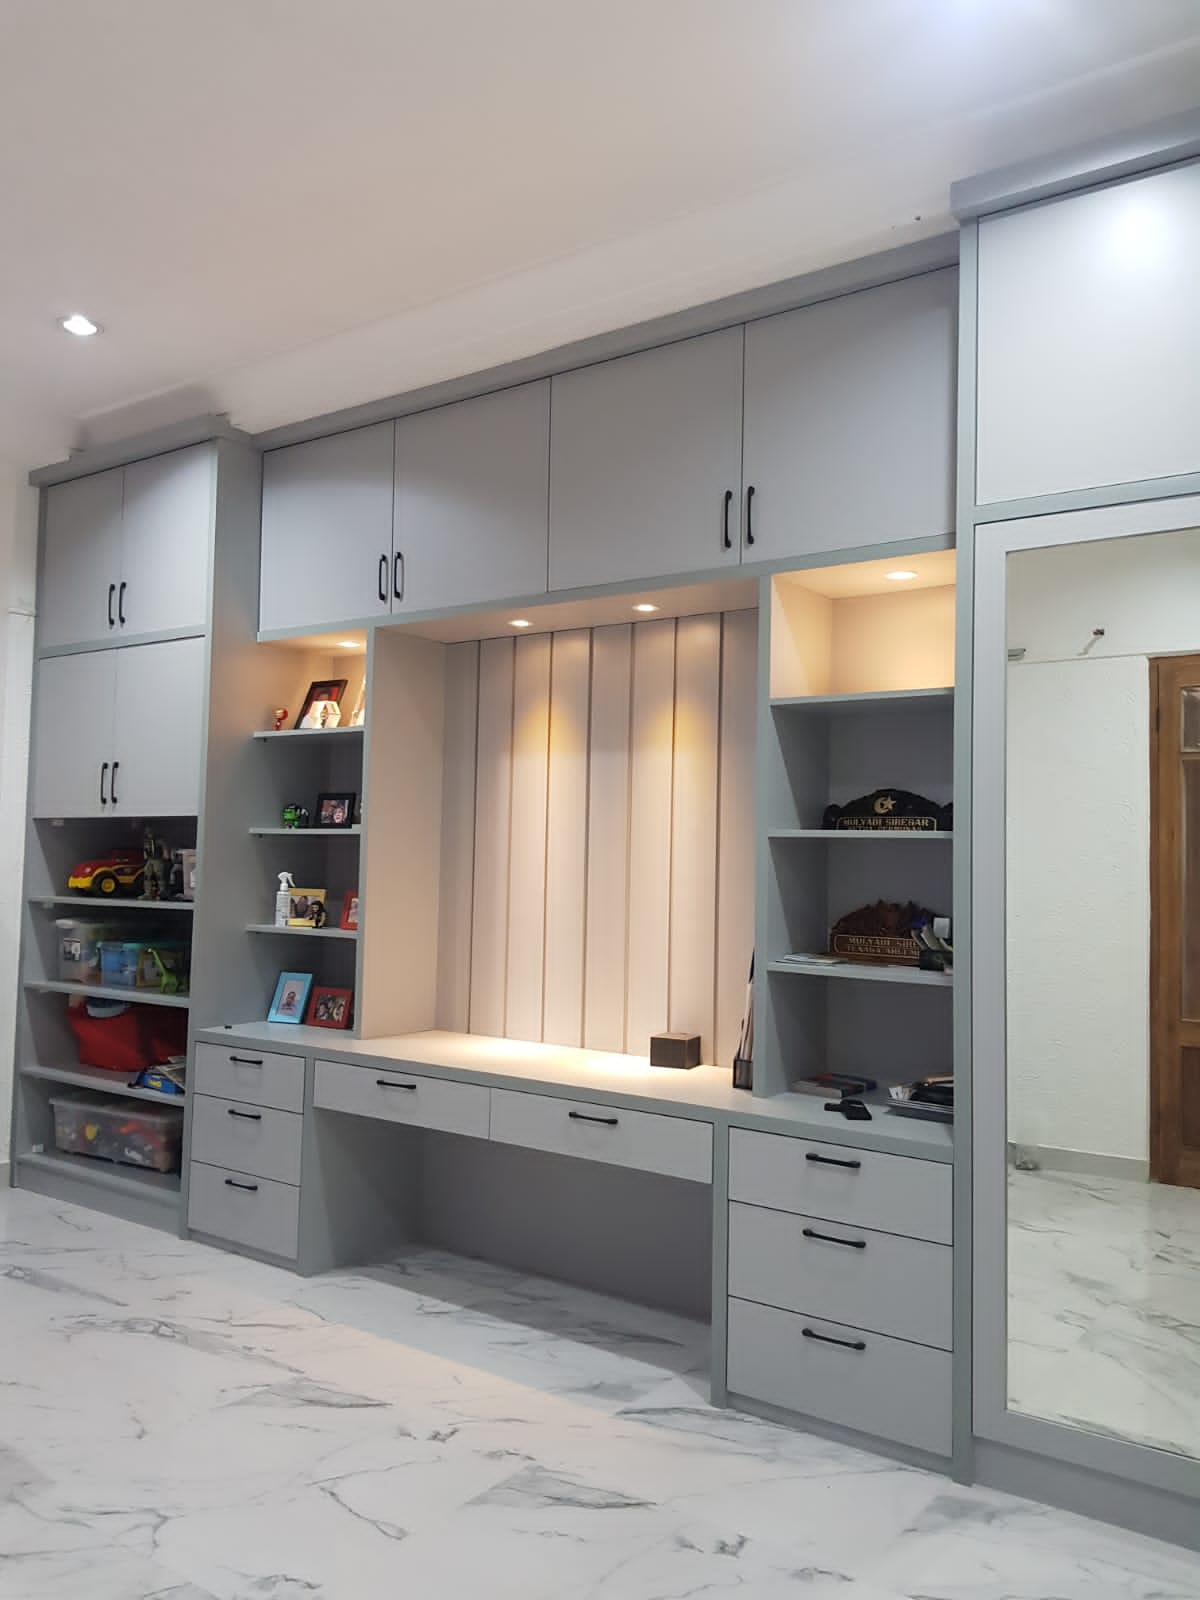 Project Belia Kitchen Set - Lemari Serbaguna - Pondok Indah - Ibu Tyaimage00003